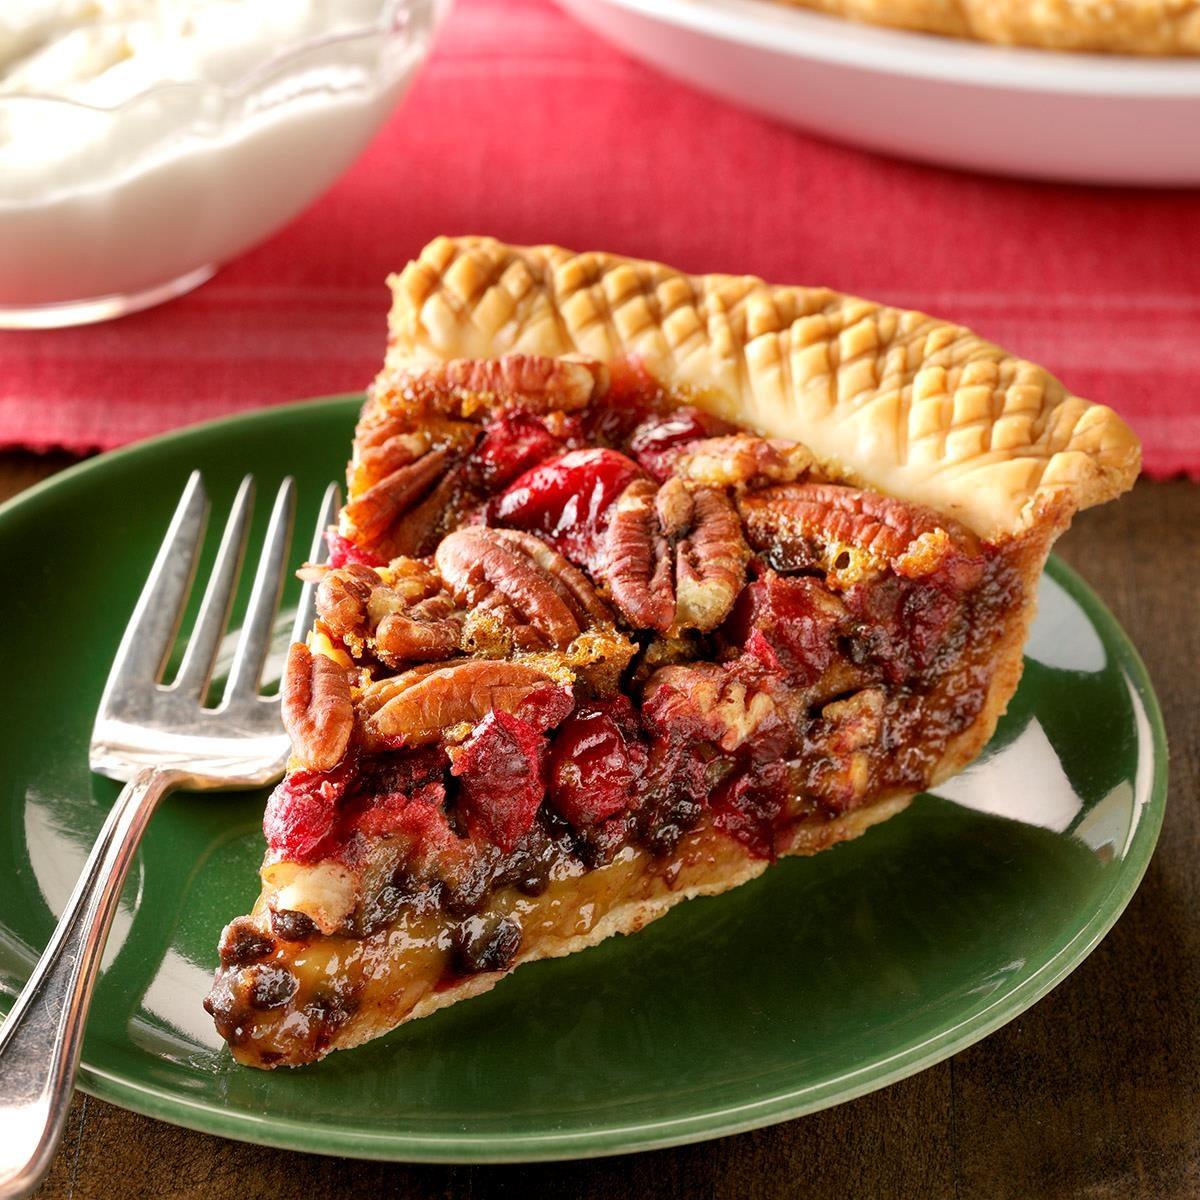 Cranberry Chocolate Chip Pecan Pie